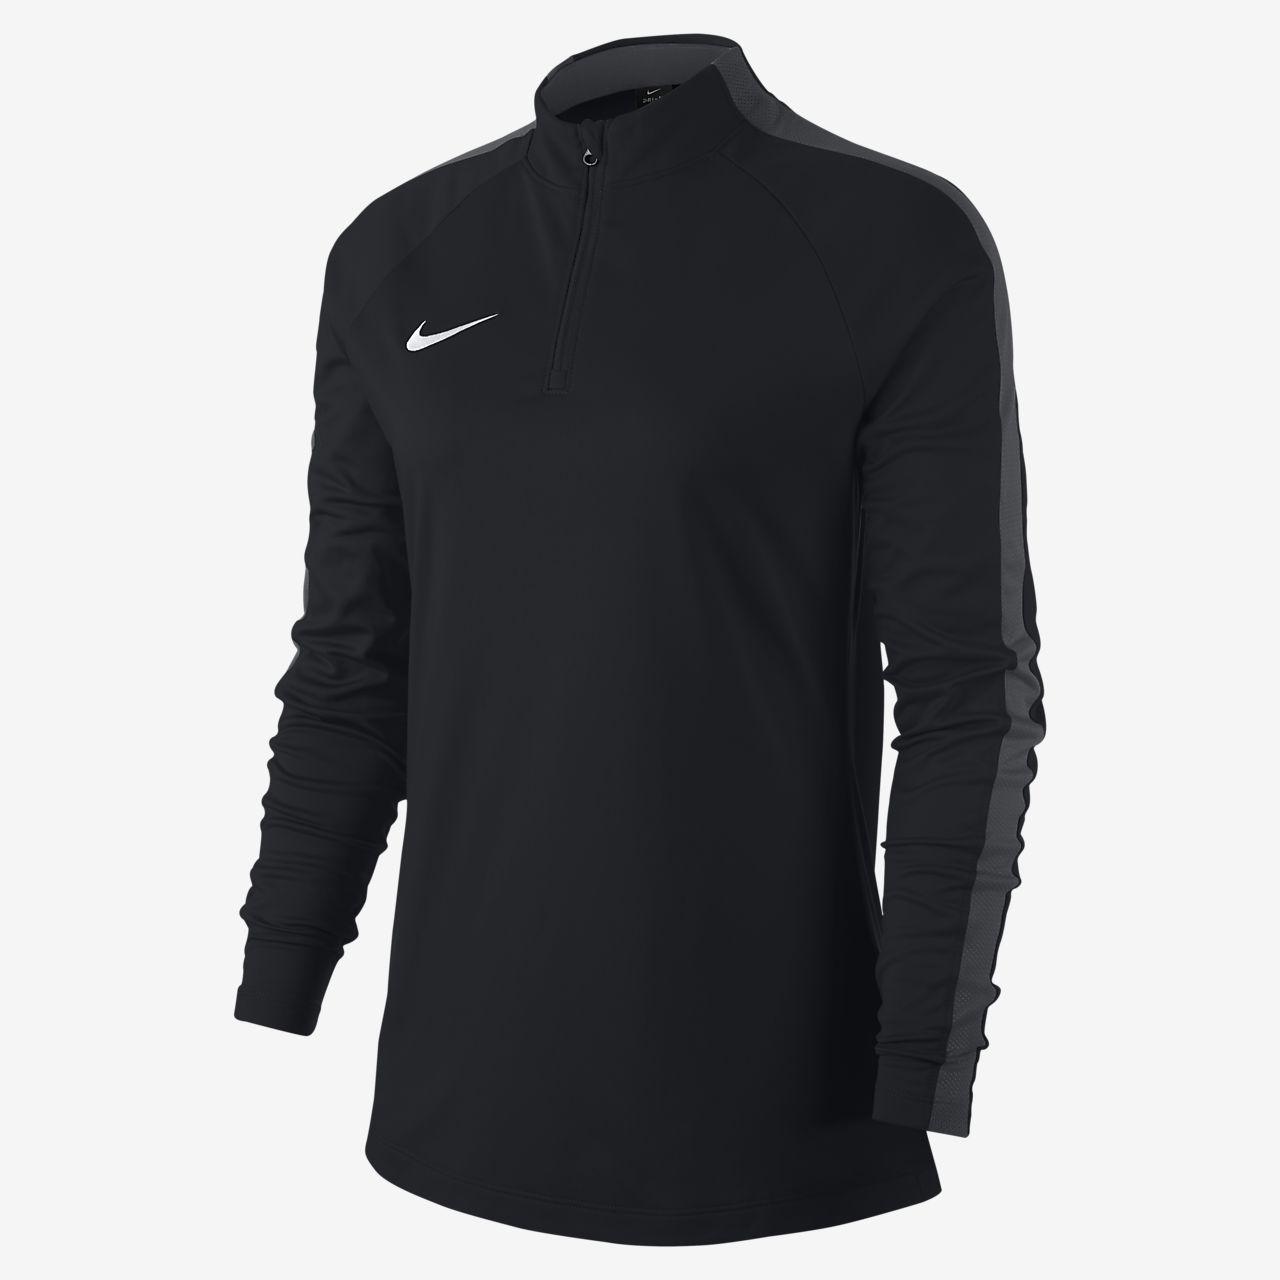 Nike Dri FIT Koszulka dziecięca Koszulki Ubrania